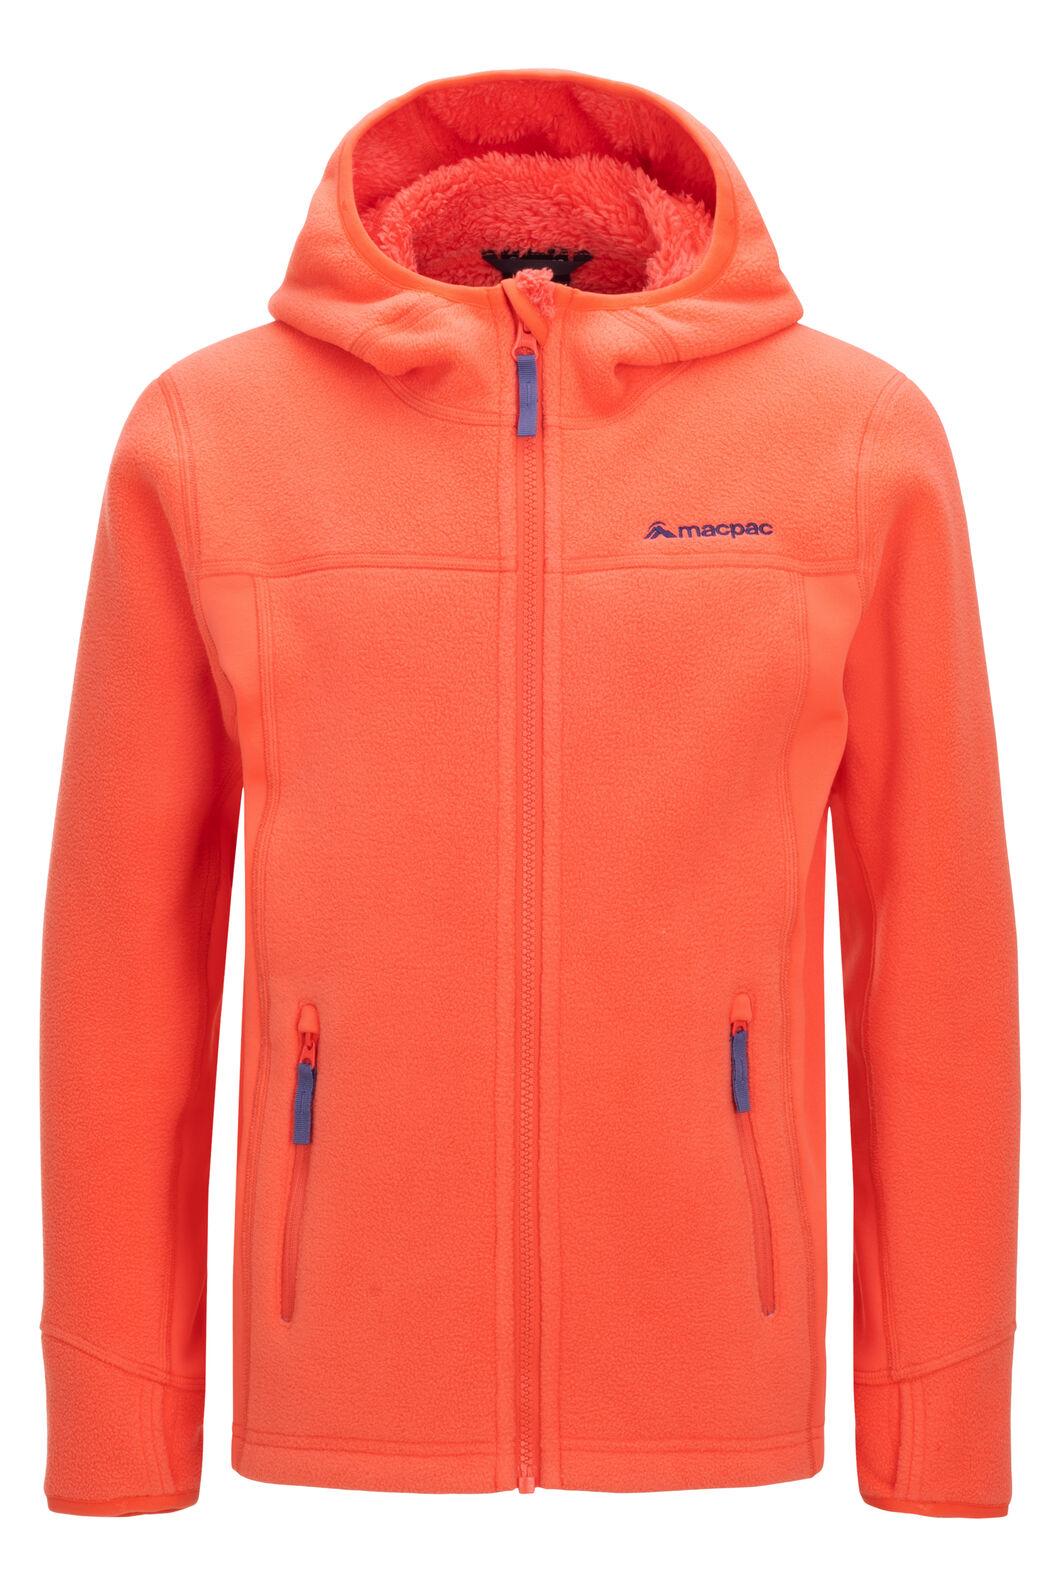 Macpac Mini Mountain Hooded Jacket — Kids', Living Coral, hi-res